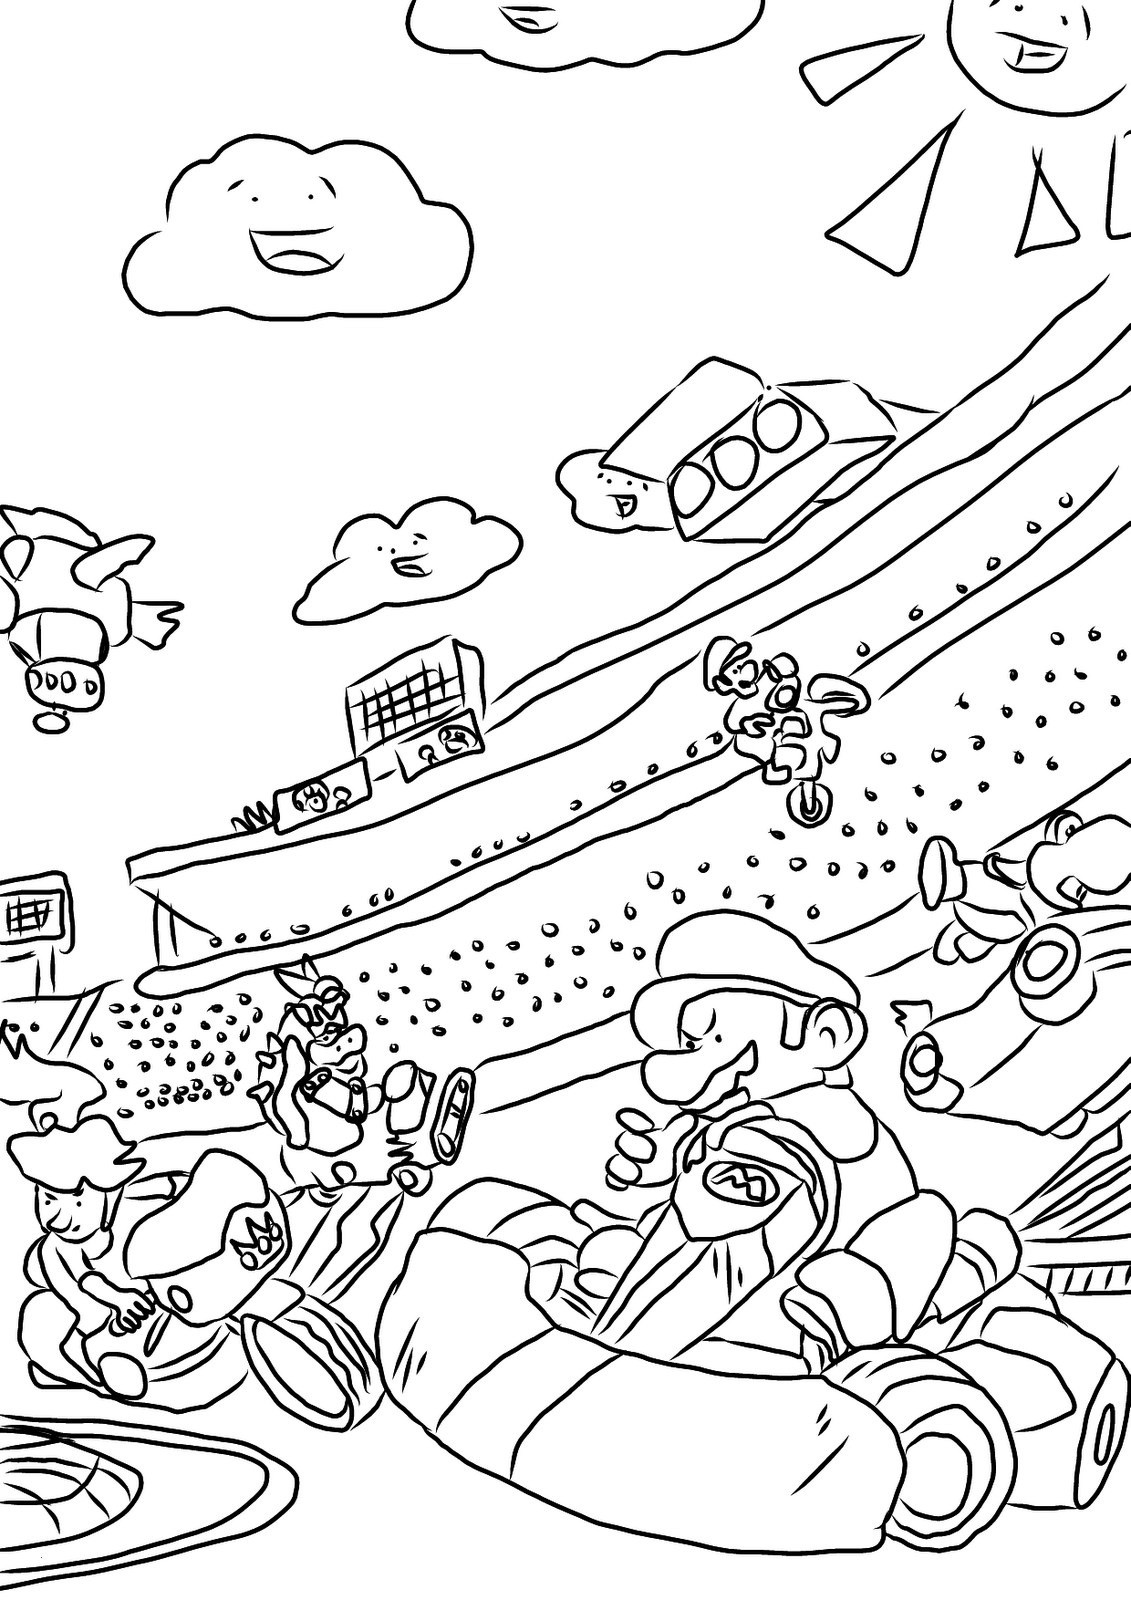 Mario Kart Ausmalbilder Neu 37 Super Mario Kart Ausmalbilder Scoredatscore Inspirierend Super Bilder